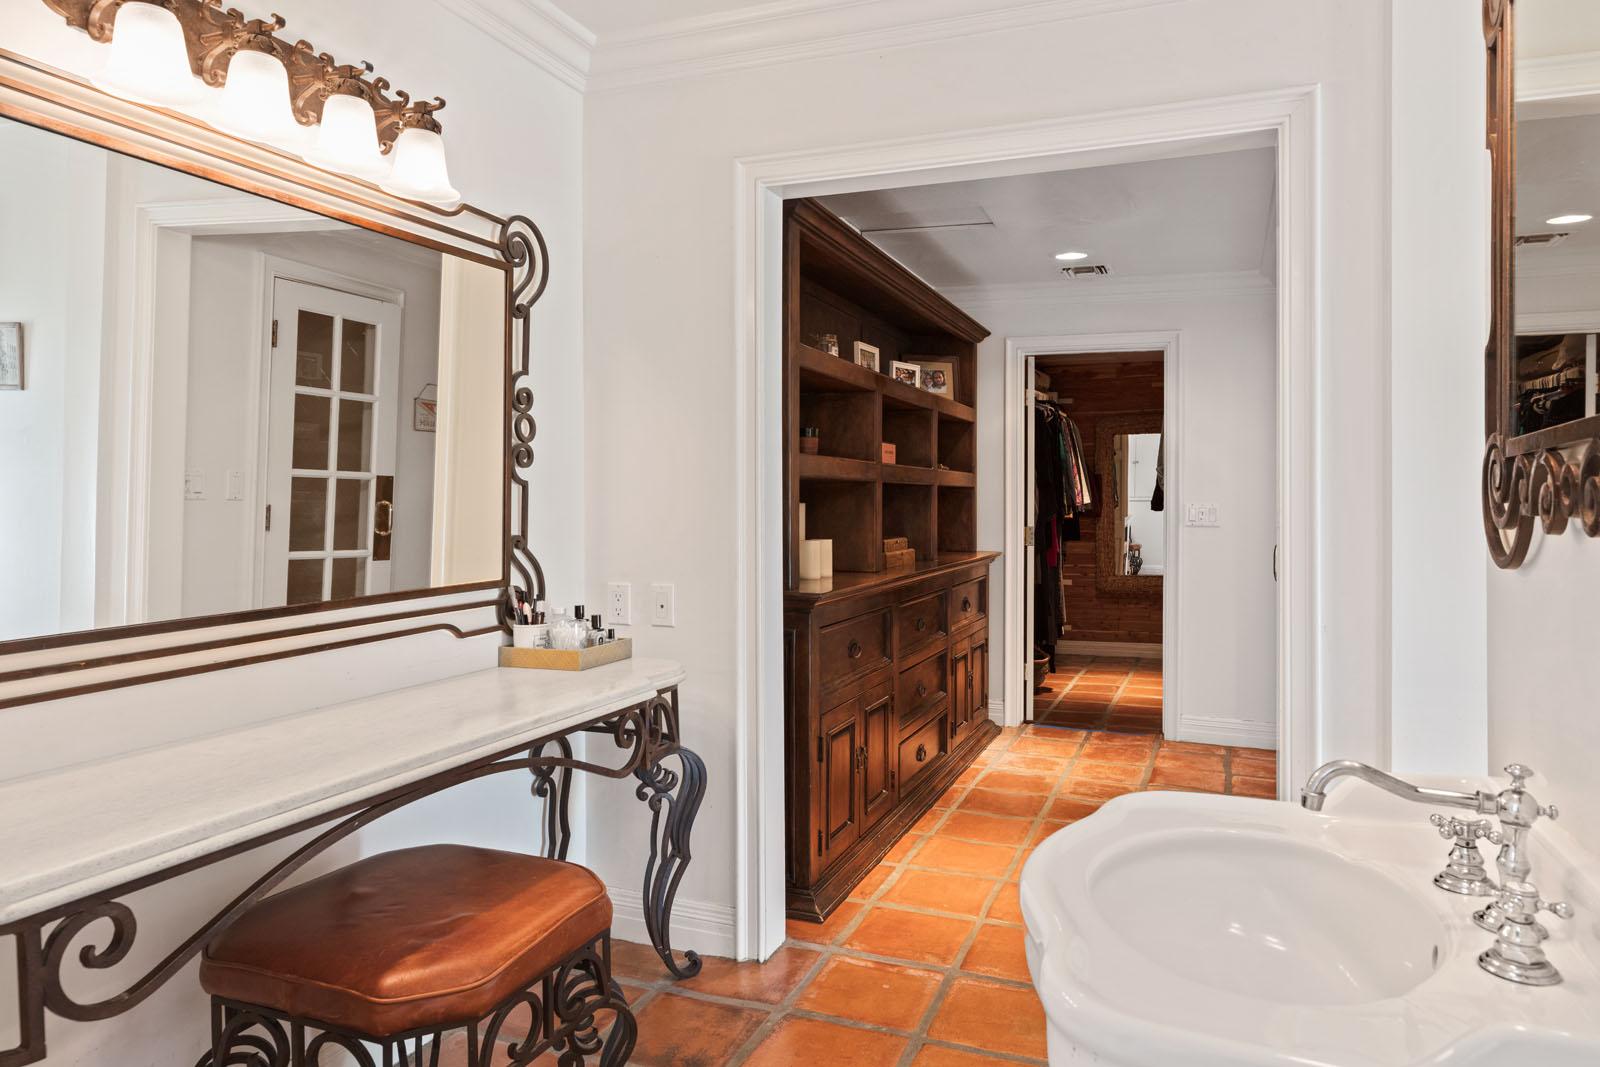 019 Master Bathroom 1712 Manzanita Park Avenue Malibu For Sale Lease The Malibu Life Team Luxury Real Estate.jpg